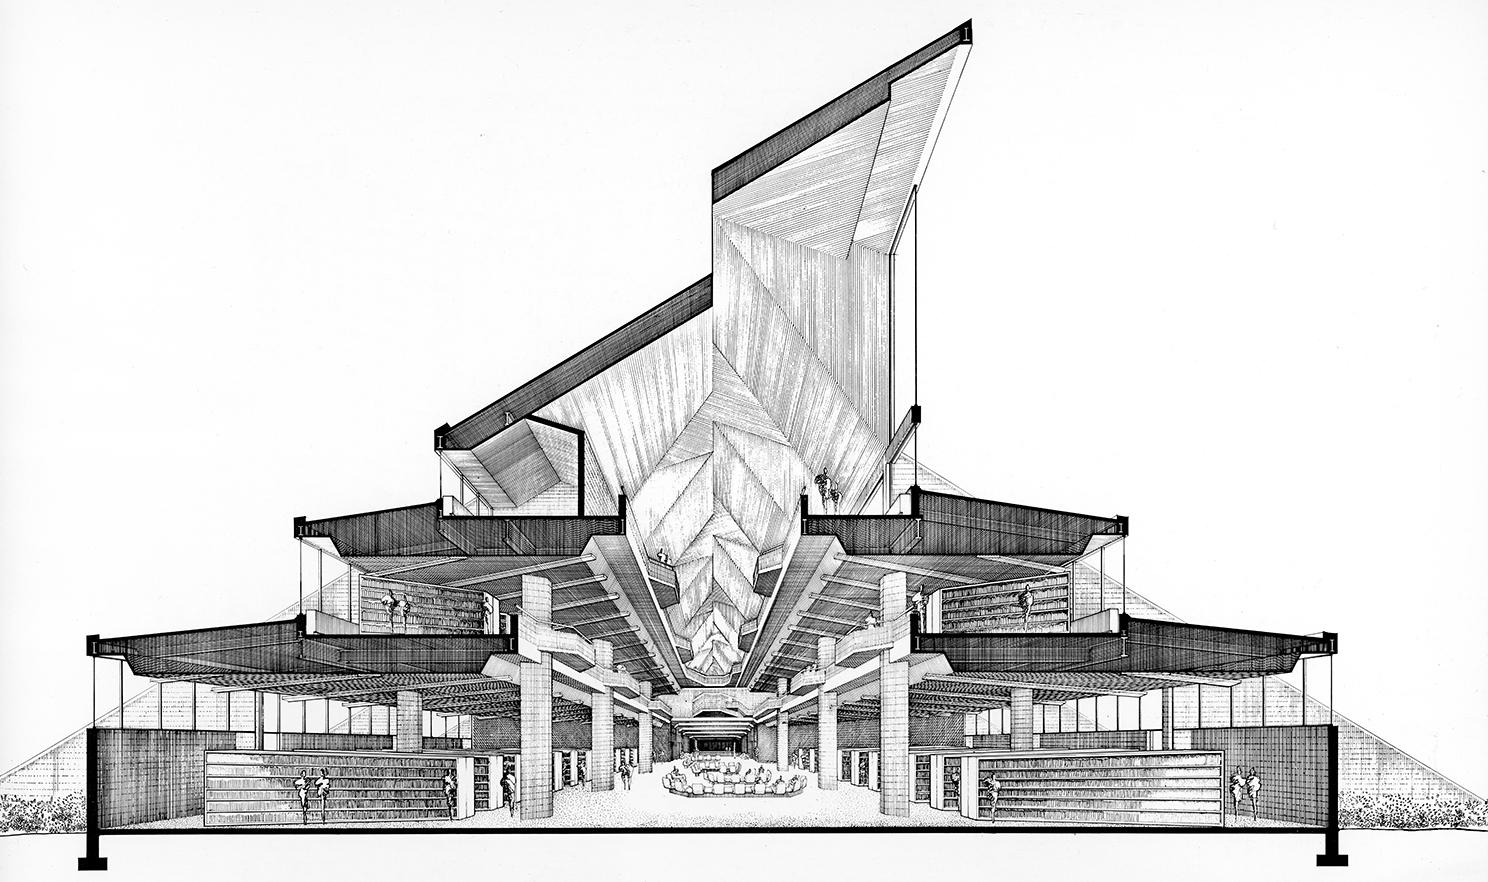 Niagara Falls Public Library, Niagara Falls, NY.  Section Perspective Rendering.